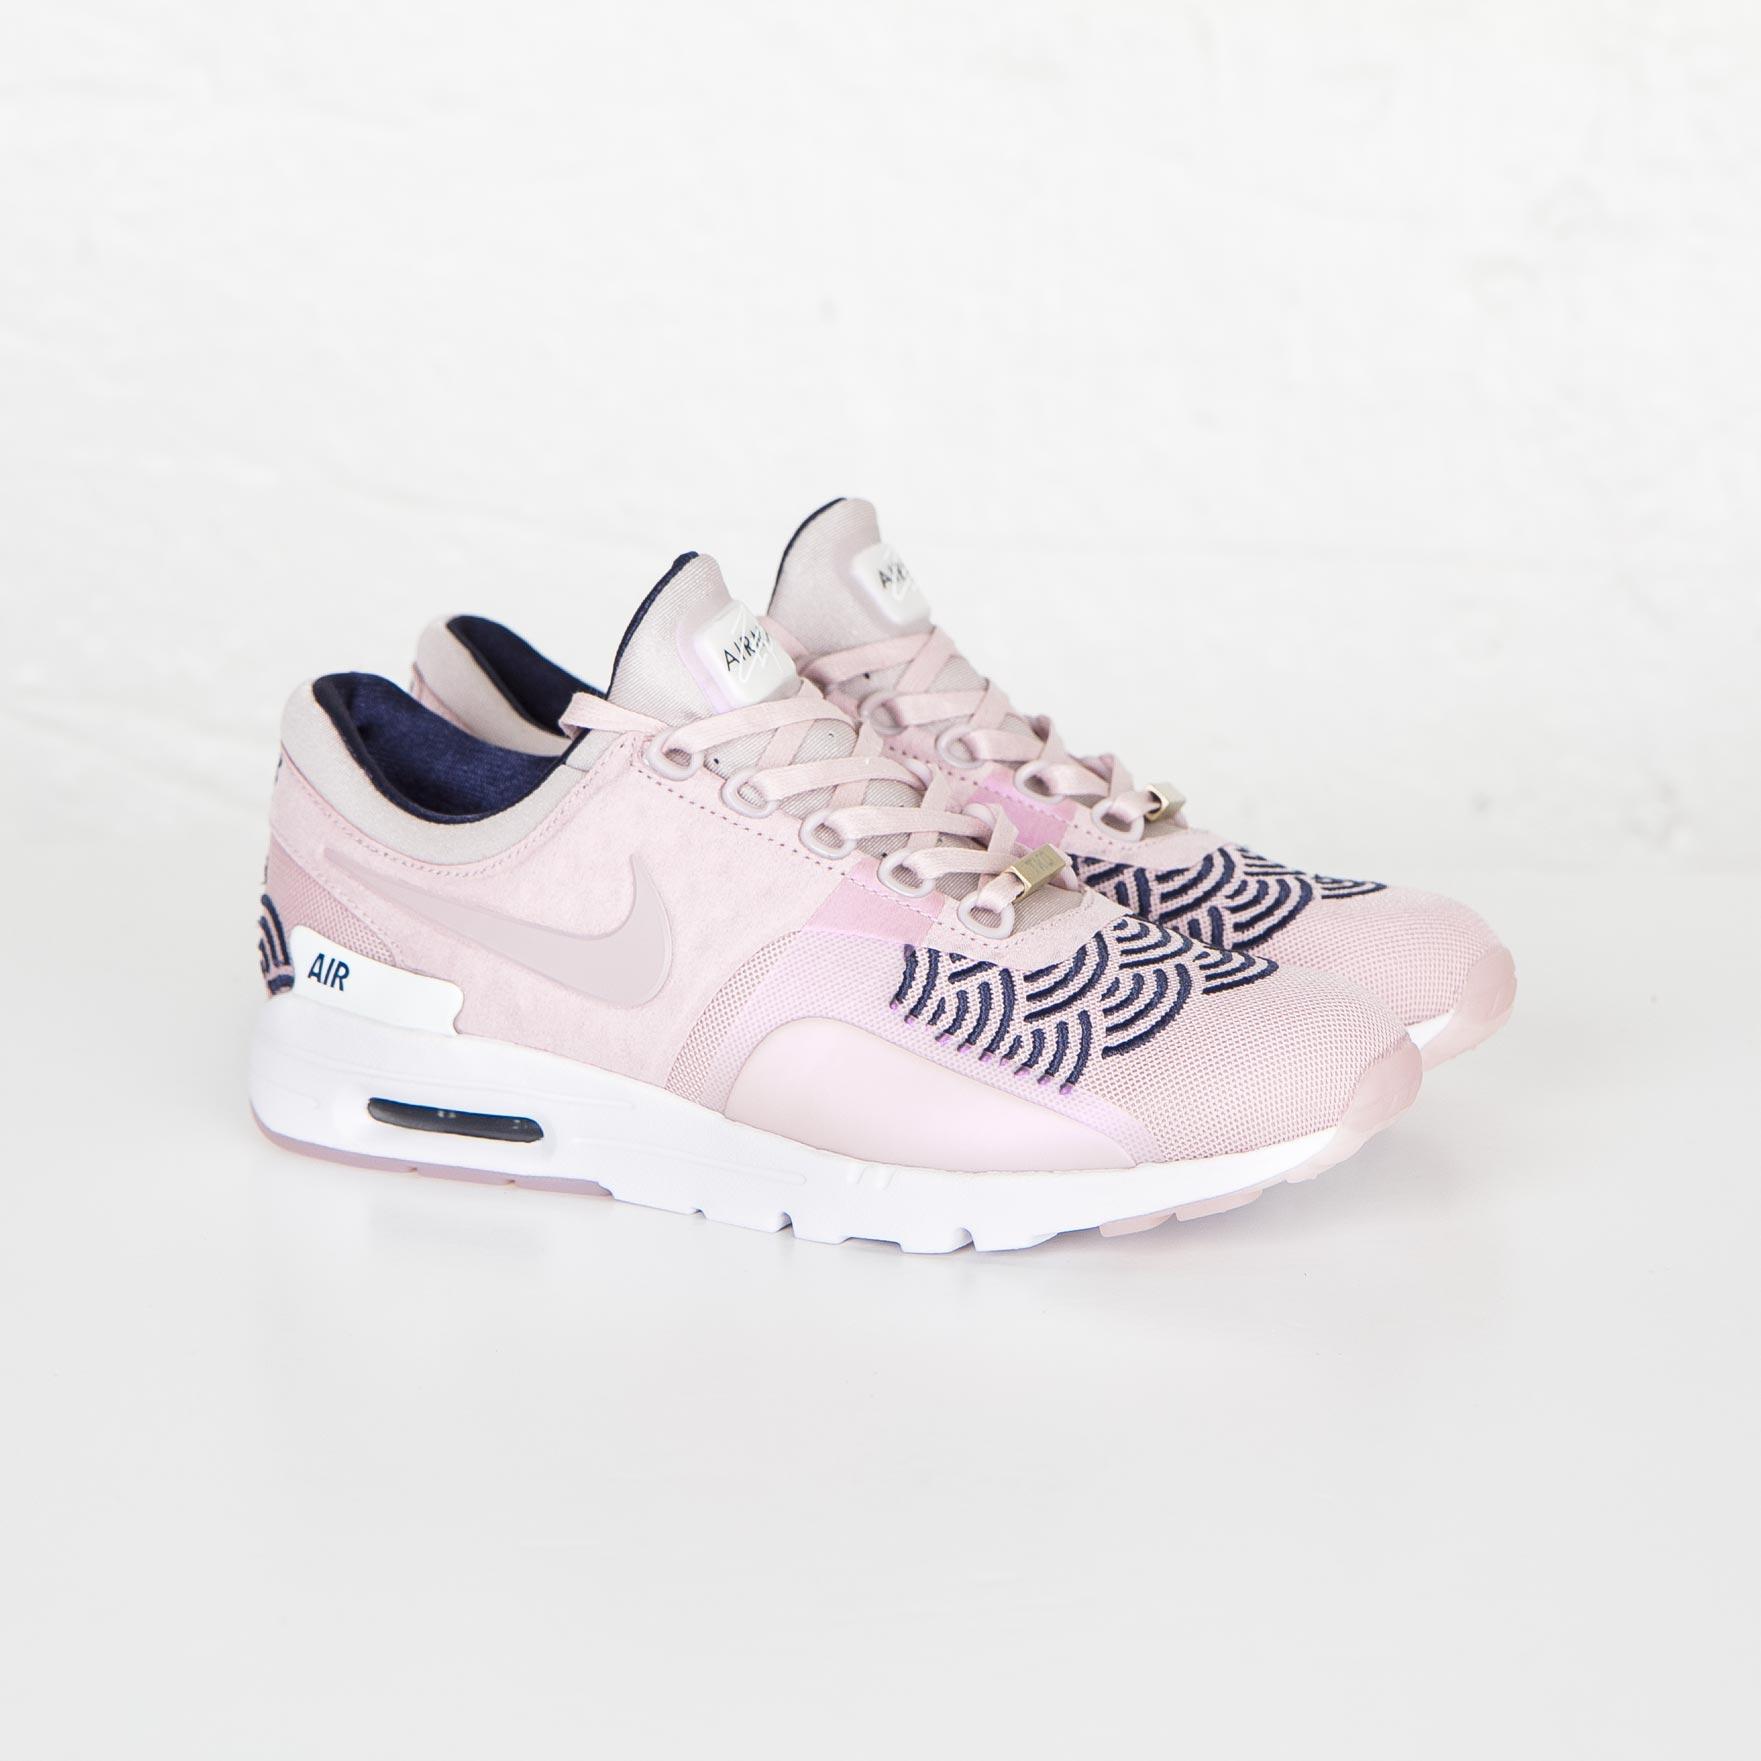 06296d46 Nike W Air Max Zero LOTC QS - 847125-600 - Sneakersnstuff | sneakers ...